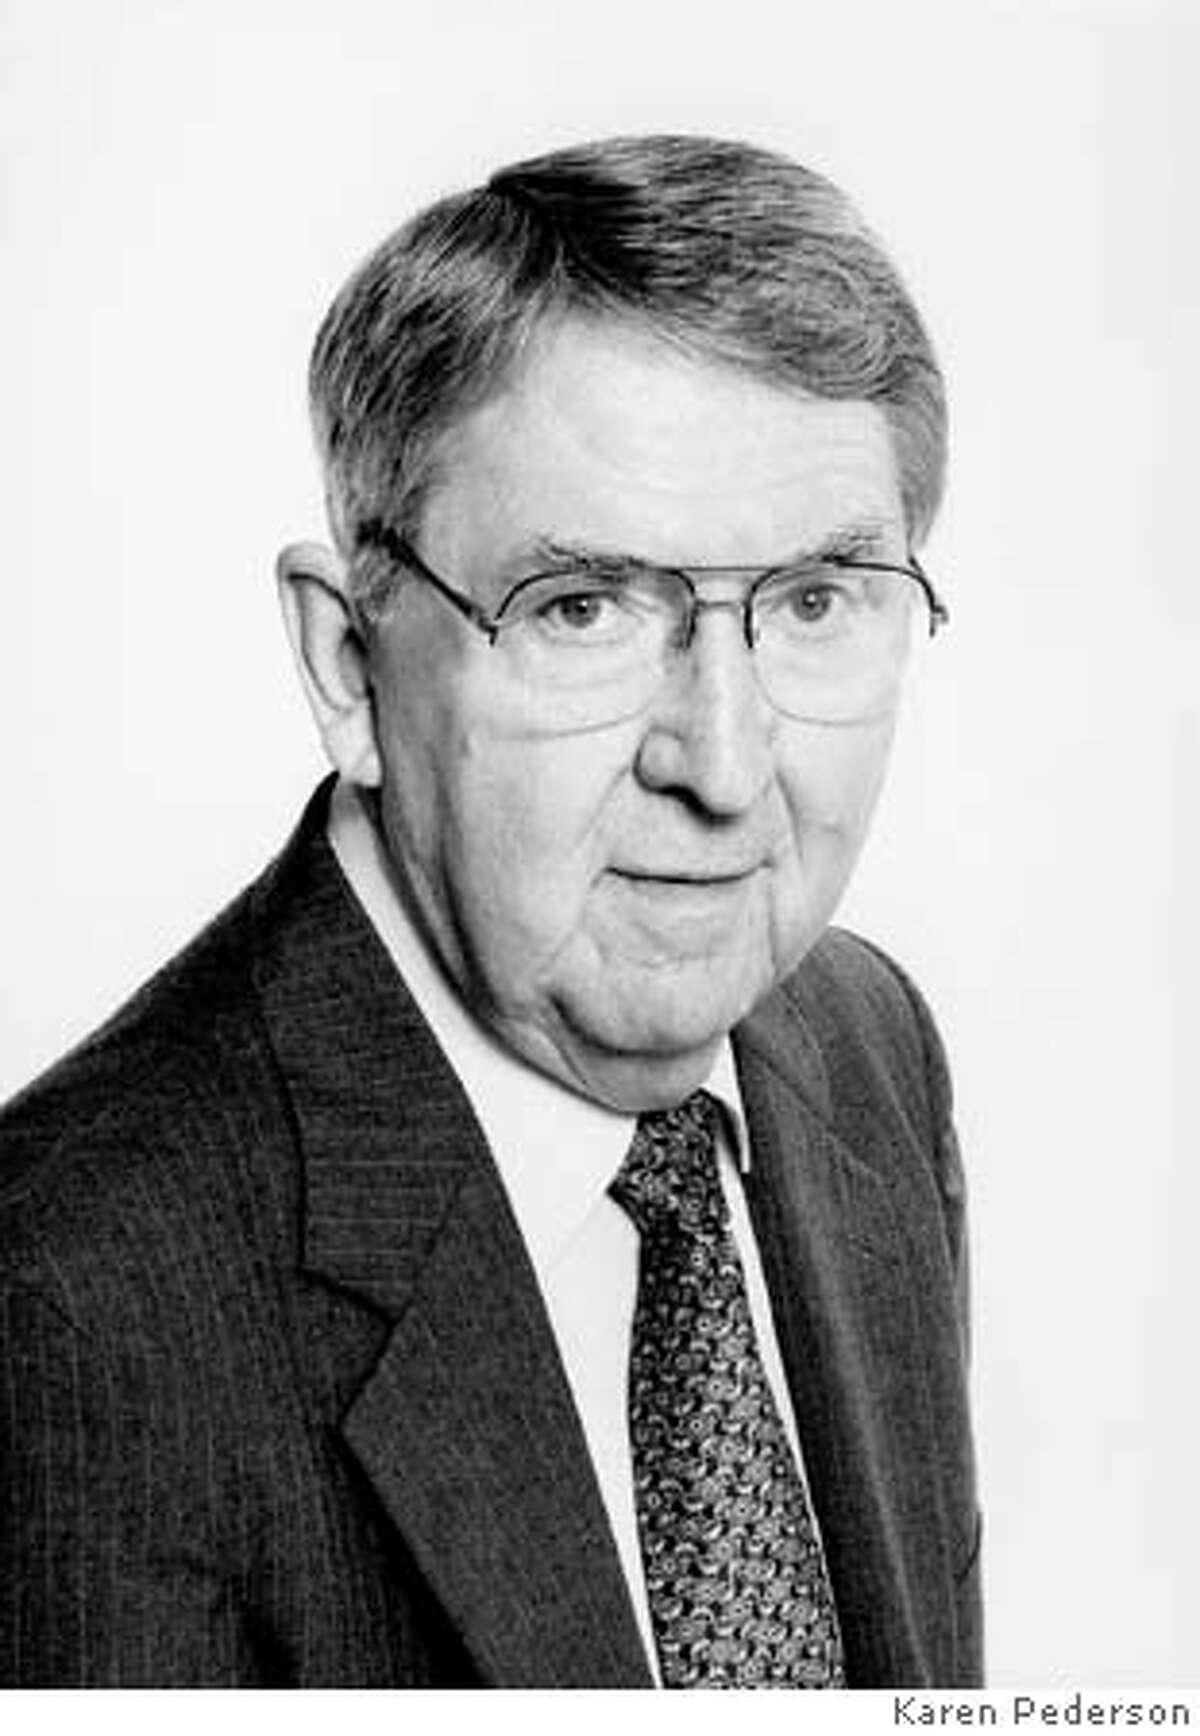 Obit photo of Donald O. Pederson, UC Berkeley professor emeritus of electrical engineering, died Dec. 25, 2004. He was 79. Photo by Karen Pederson